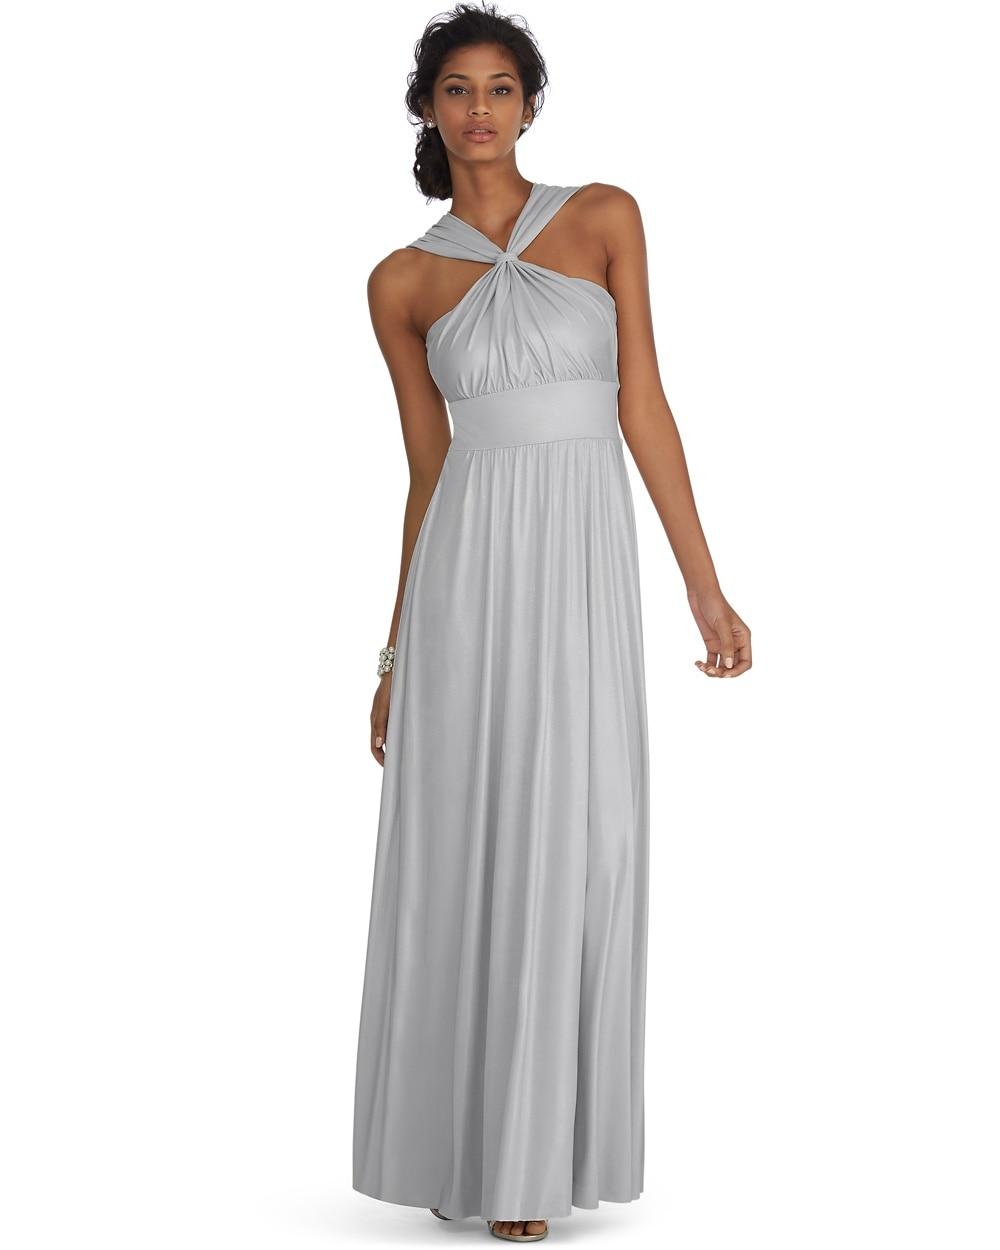 Genius Metallic Convertible Silver Gown - White House Black Market